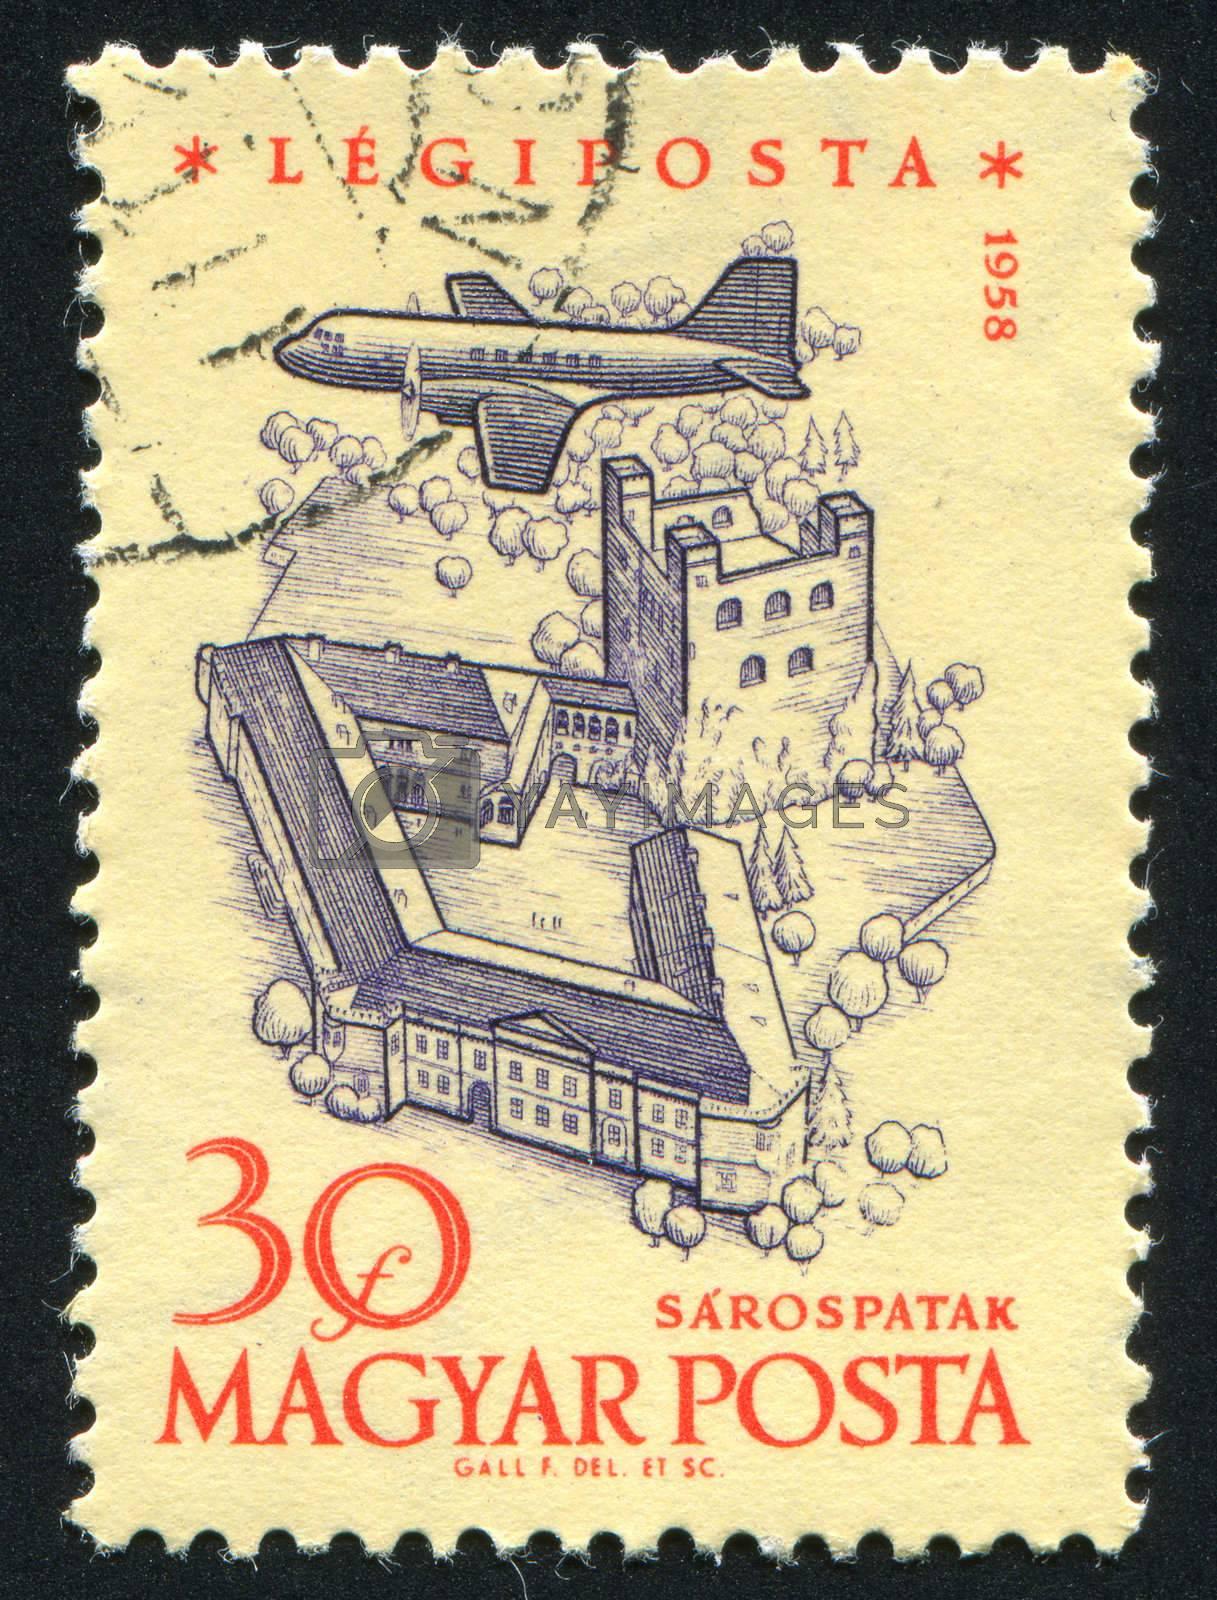 HUNGARY - CIRCA 1958: stamp printed by Hungary, shows Plane over Sarospatak, circa 1958